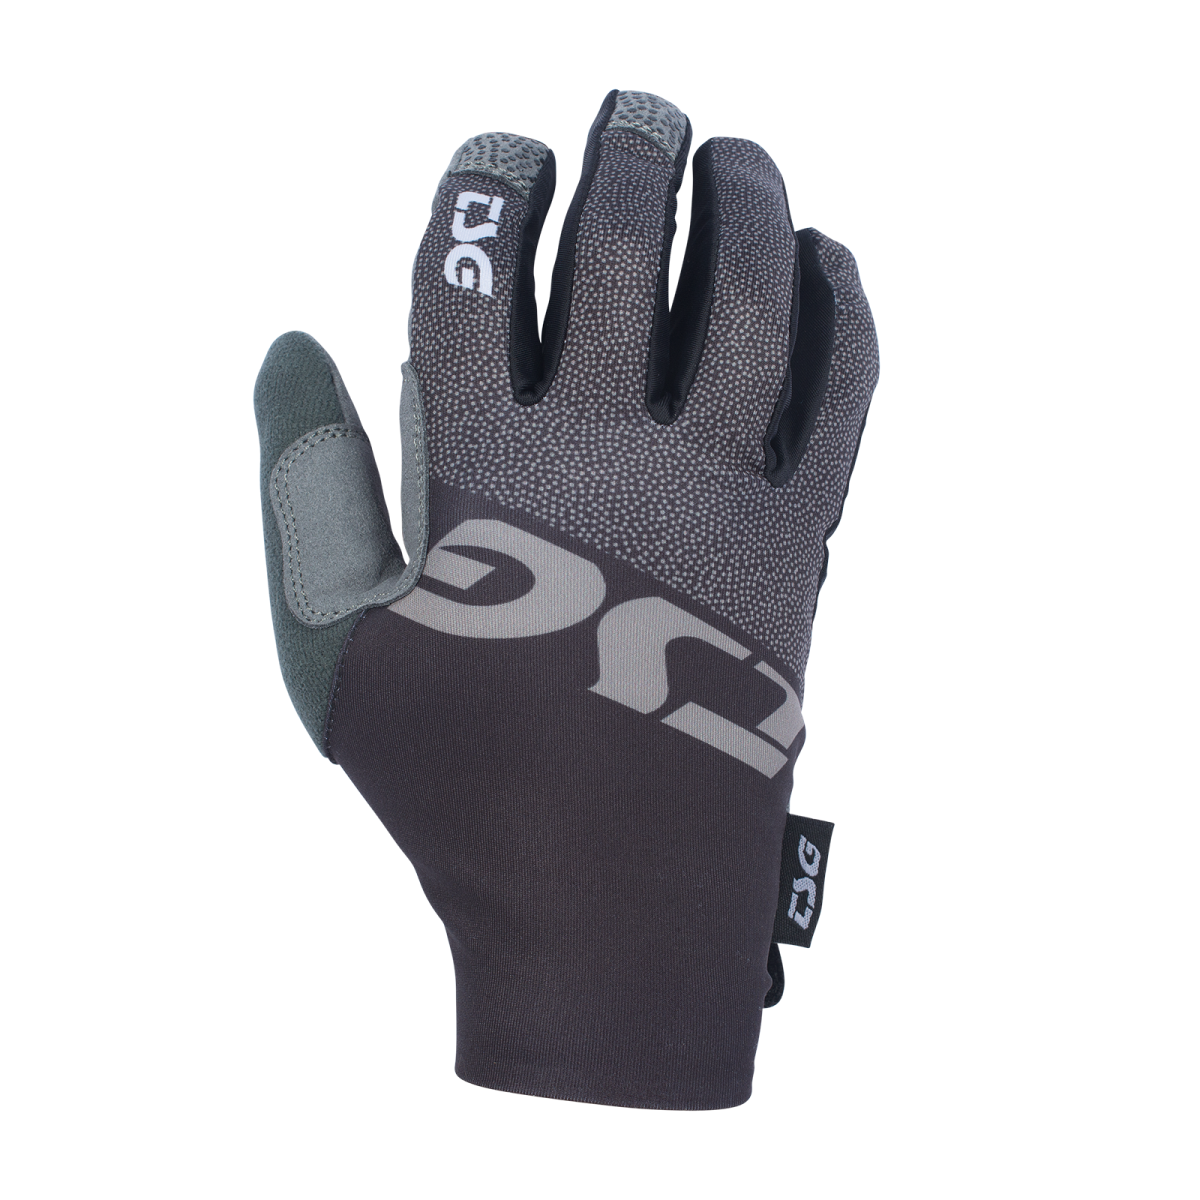 Rękawiczki TSG Mate MJ1